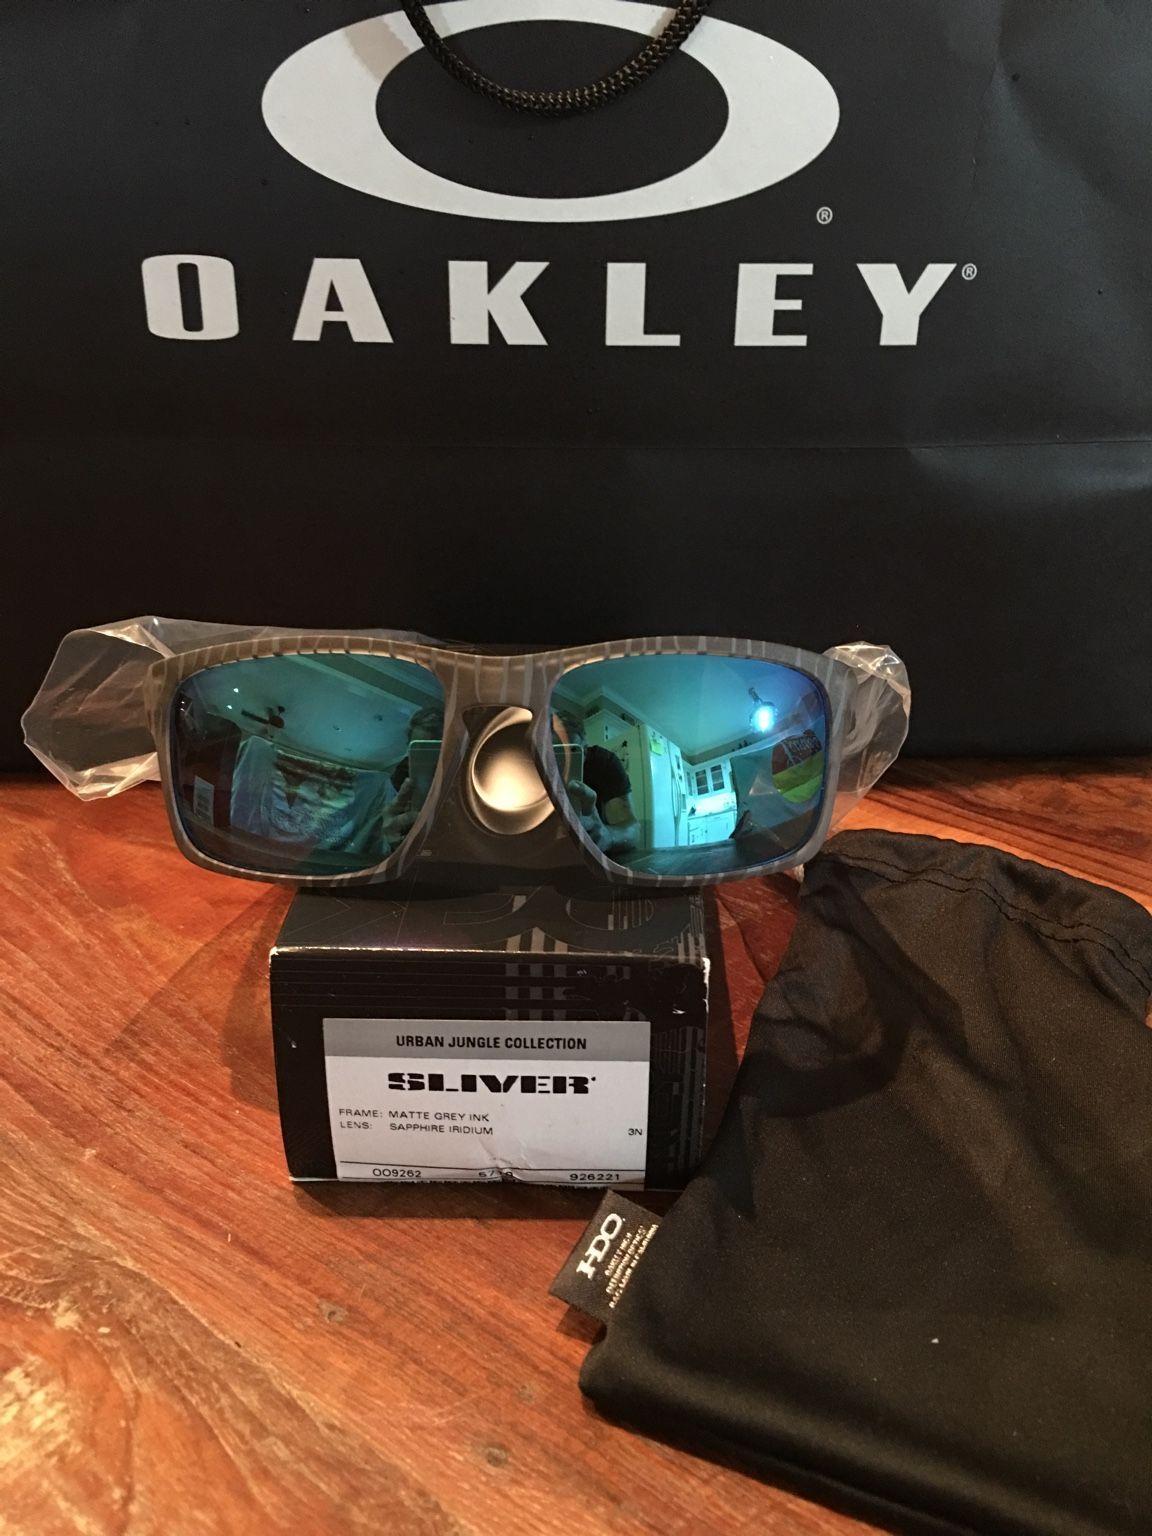 A few extra pair to sell - fbd82221c7e82a627e1f895b653bad05.jpg